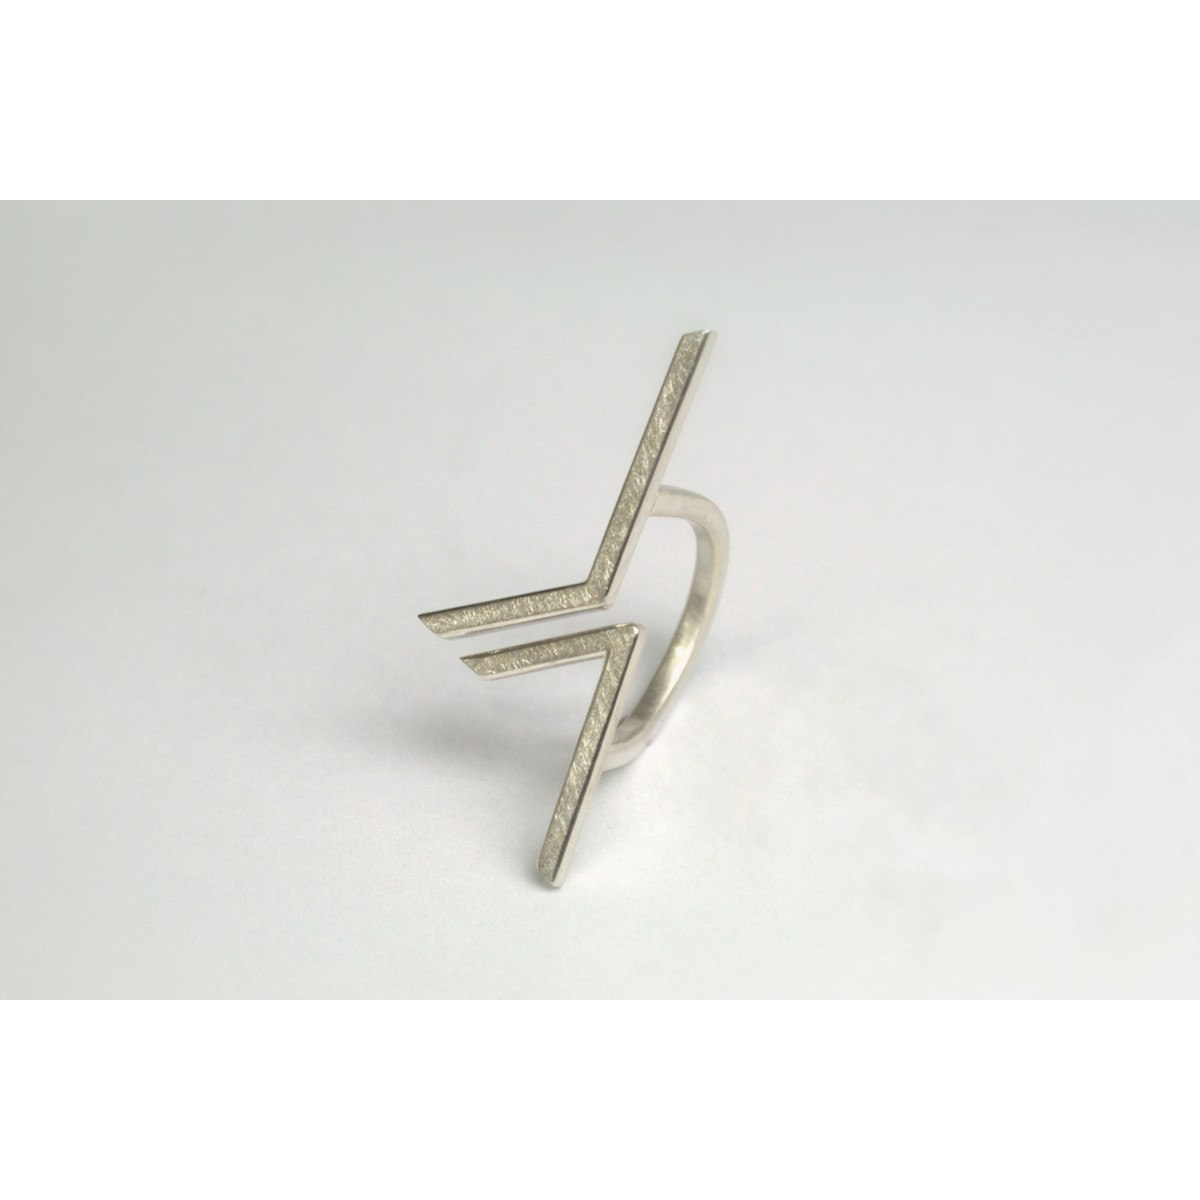 "DOPPELLUDWIG Ring ""GEZACKT"" aus 925/- Silber"